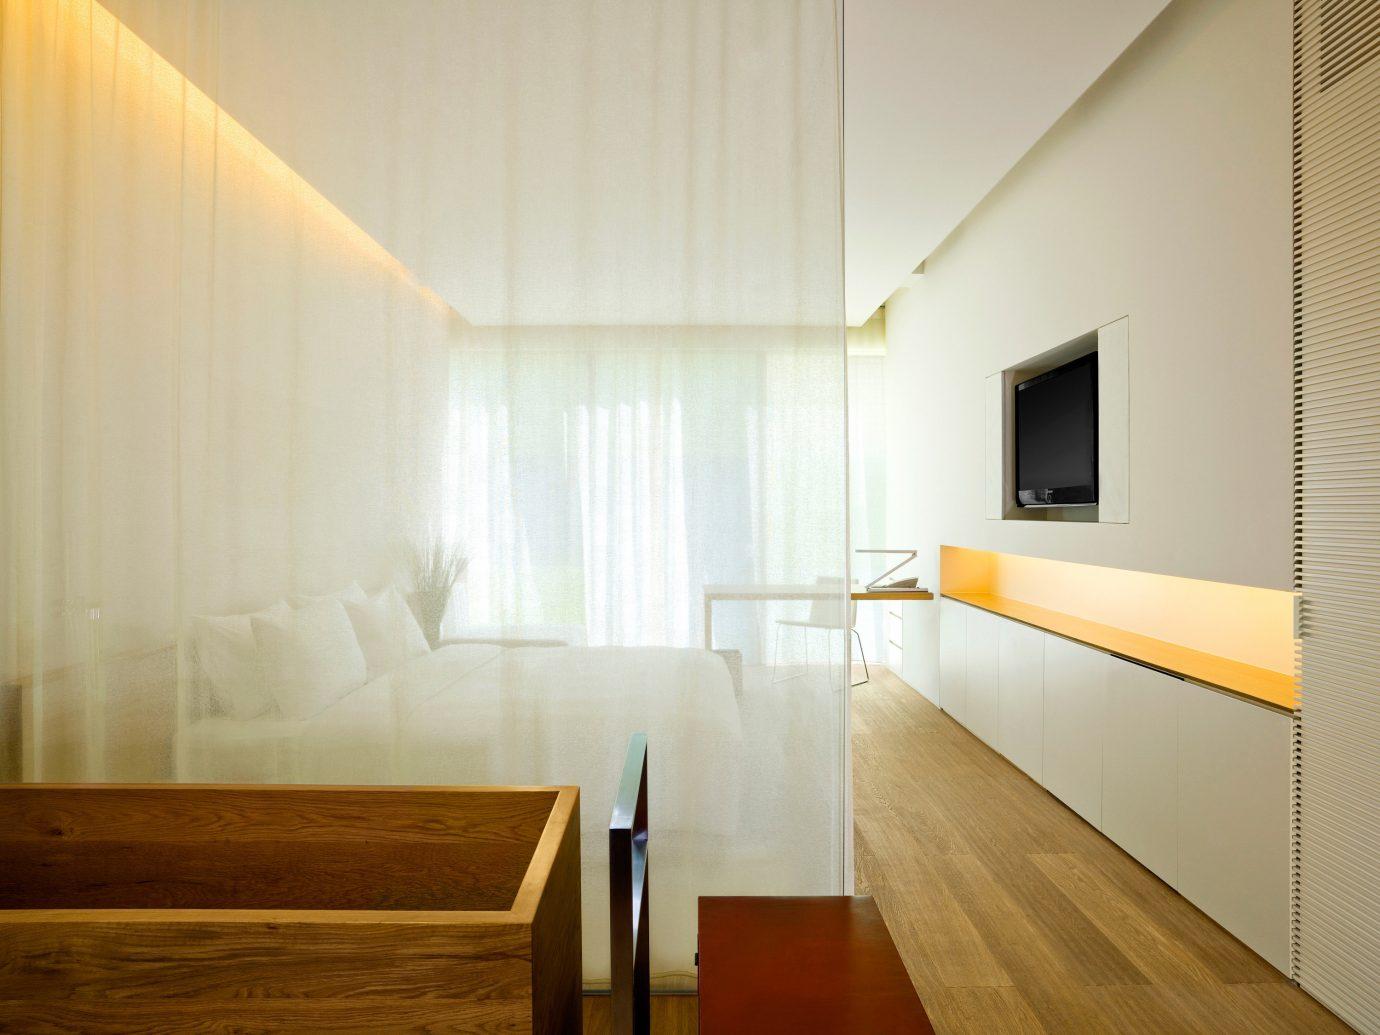 Bedroom at The Opposite House in Beijing